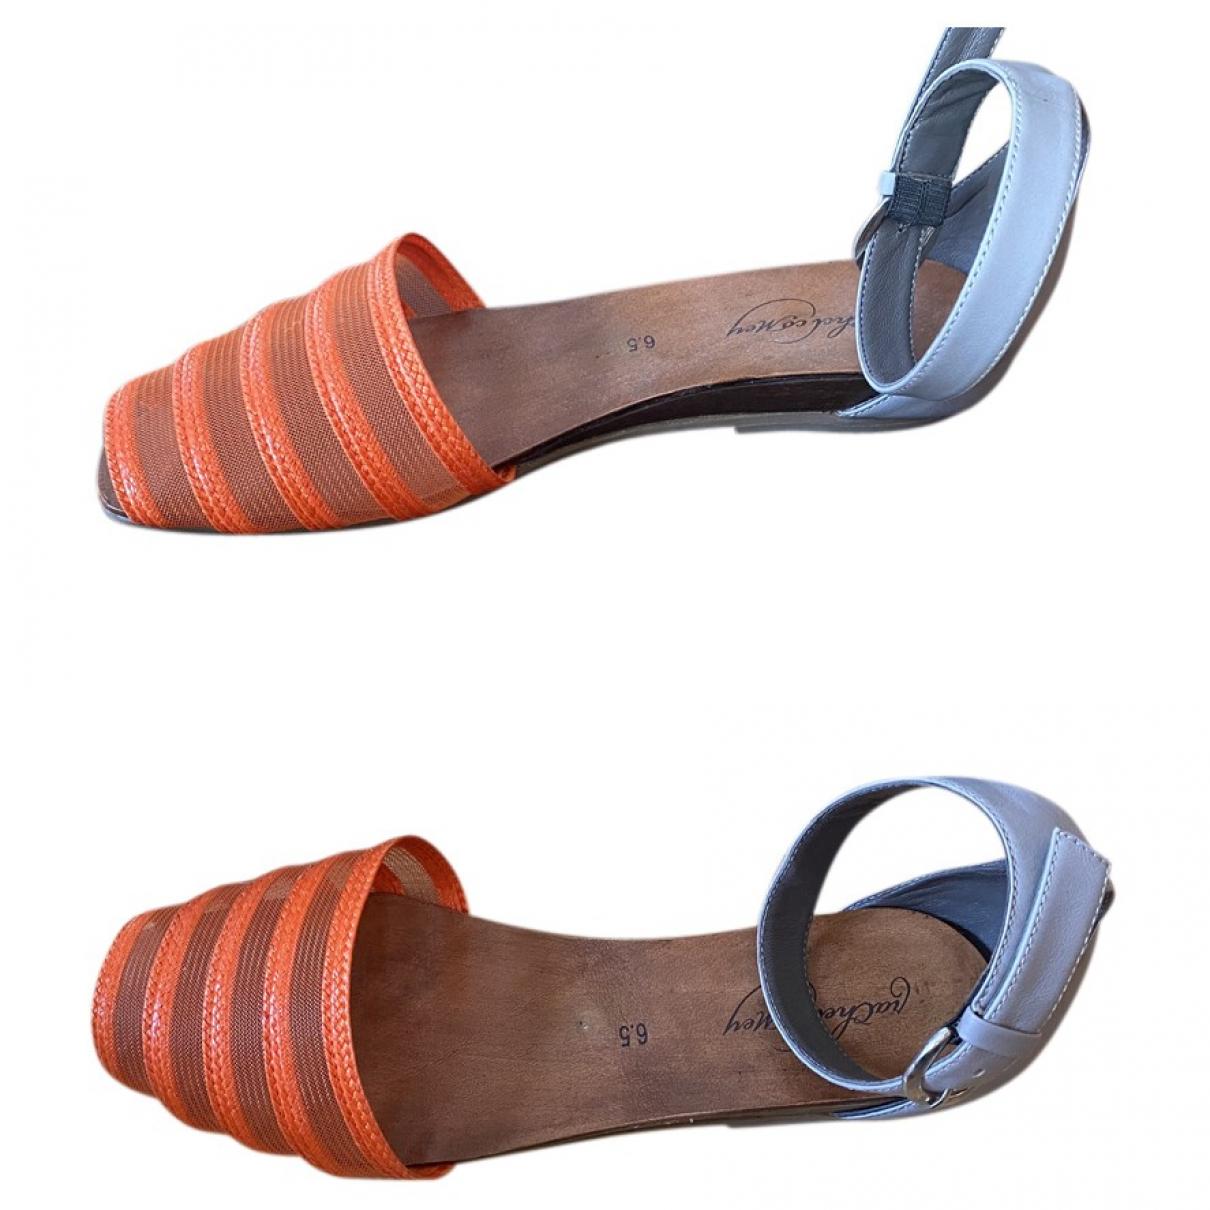 Rachel Comey \N Orange Leather Sandals for Women 6.5 US